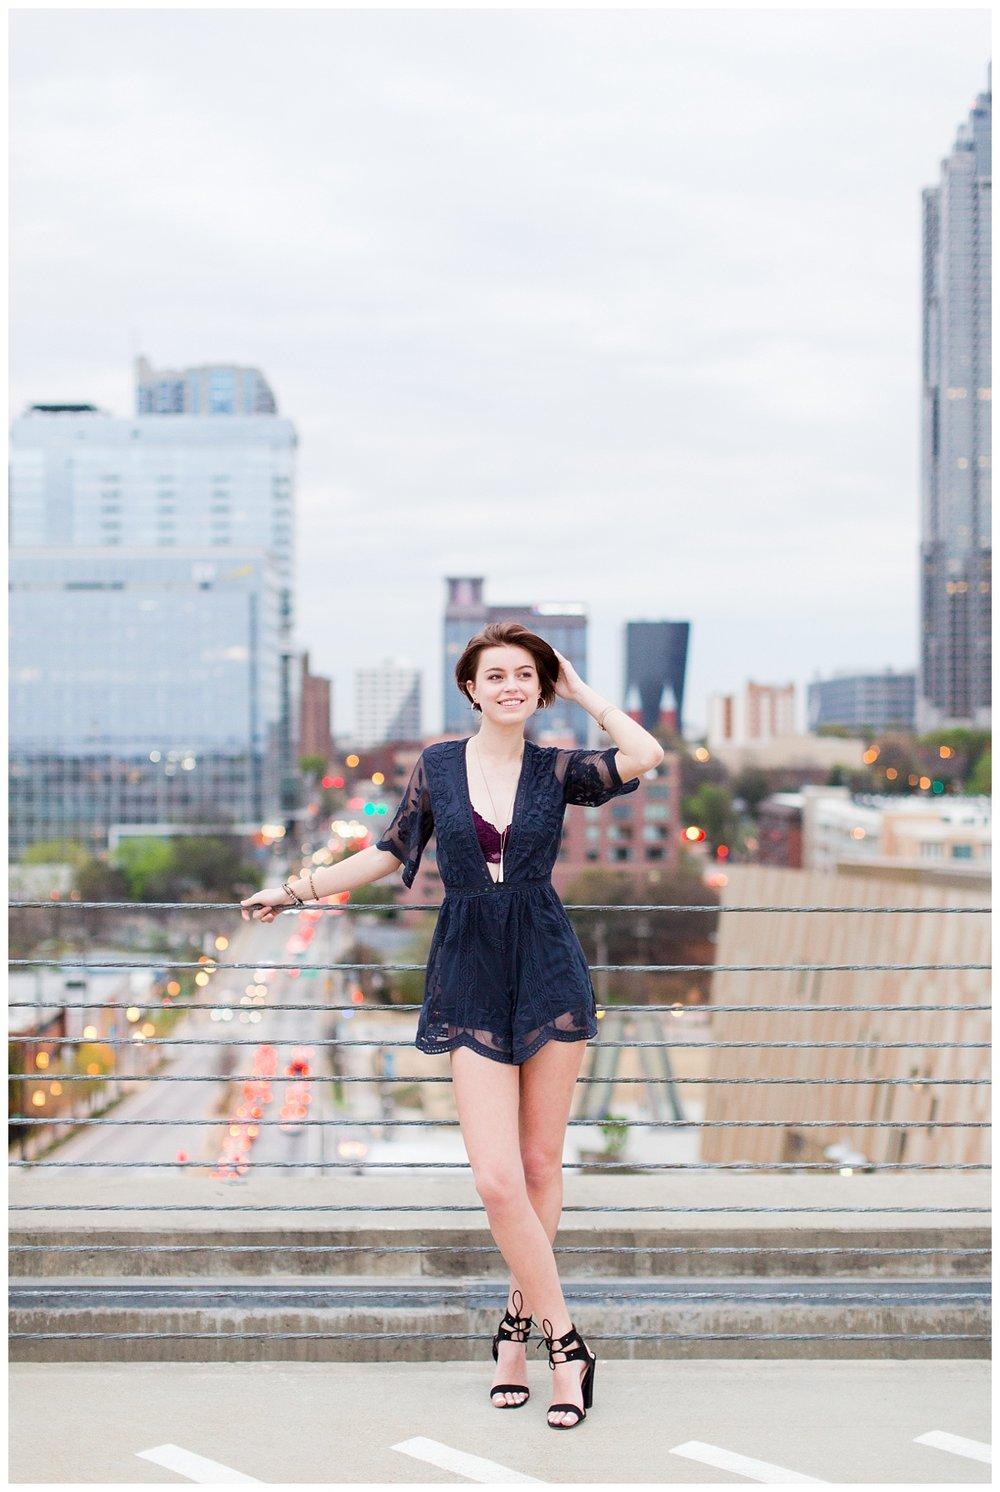 Atlanta Senior Session_Hannah_Abby Breaux Photography_Westside Provisions_0044.jpg